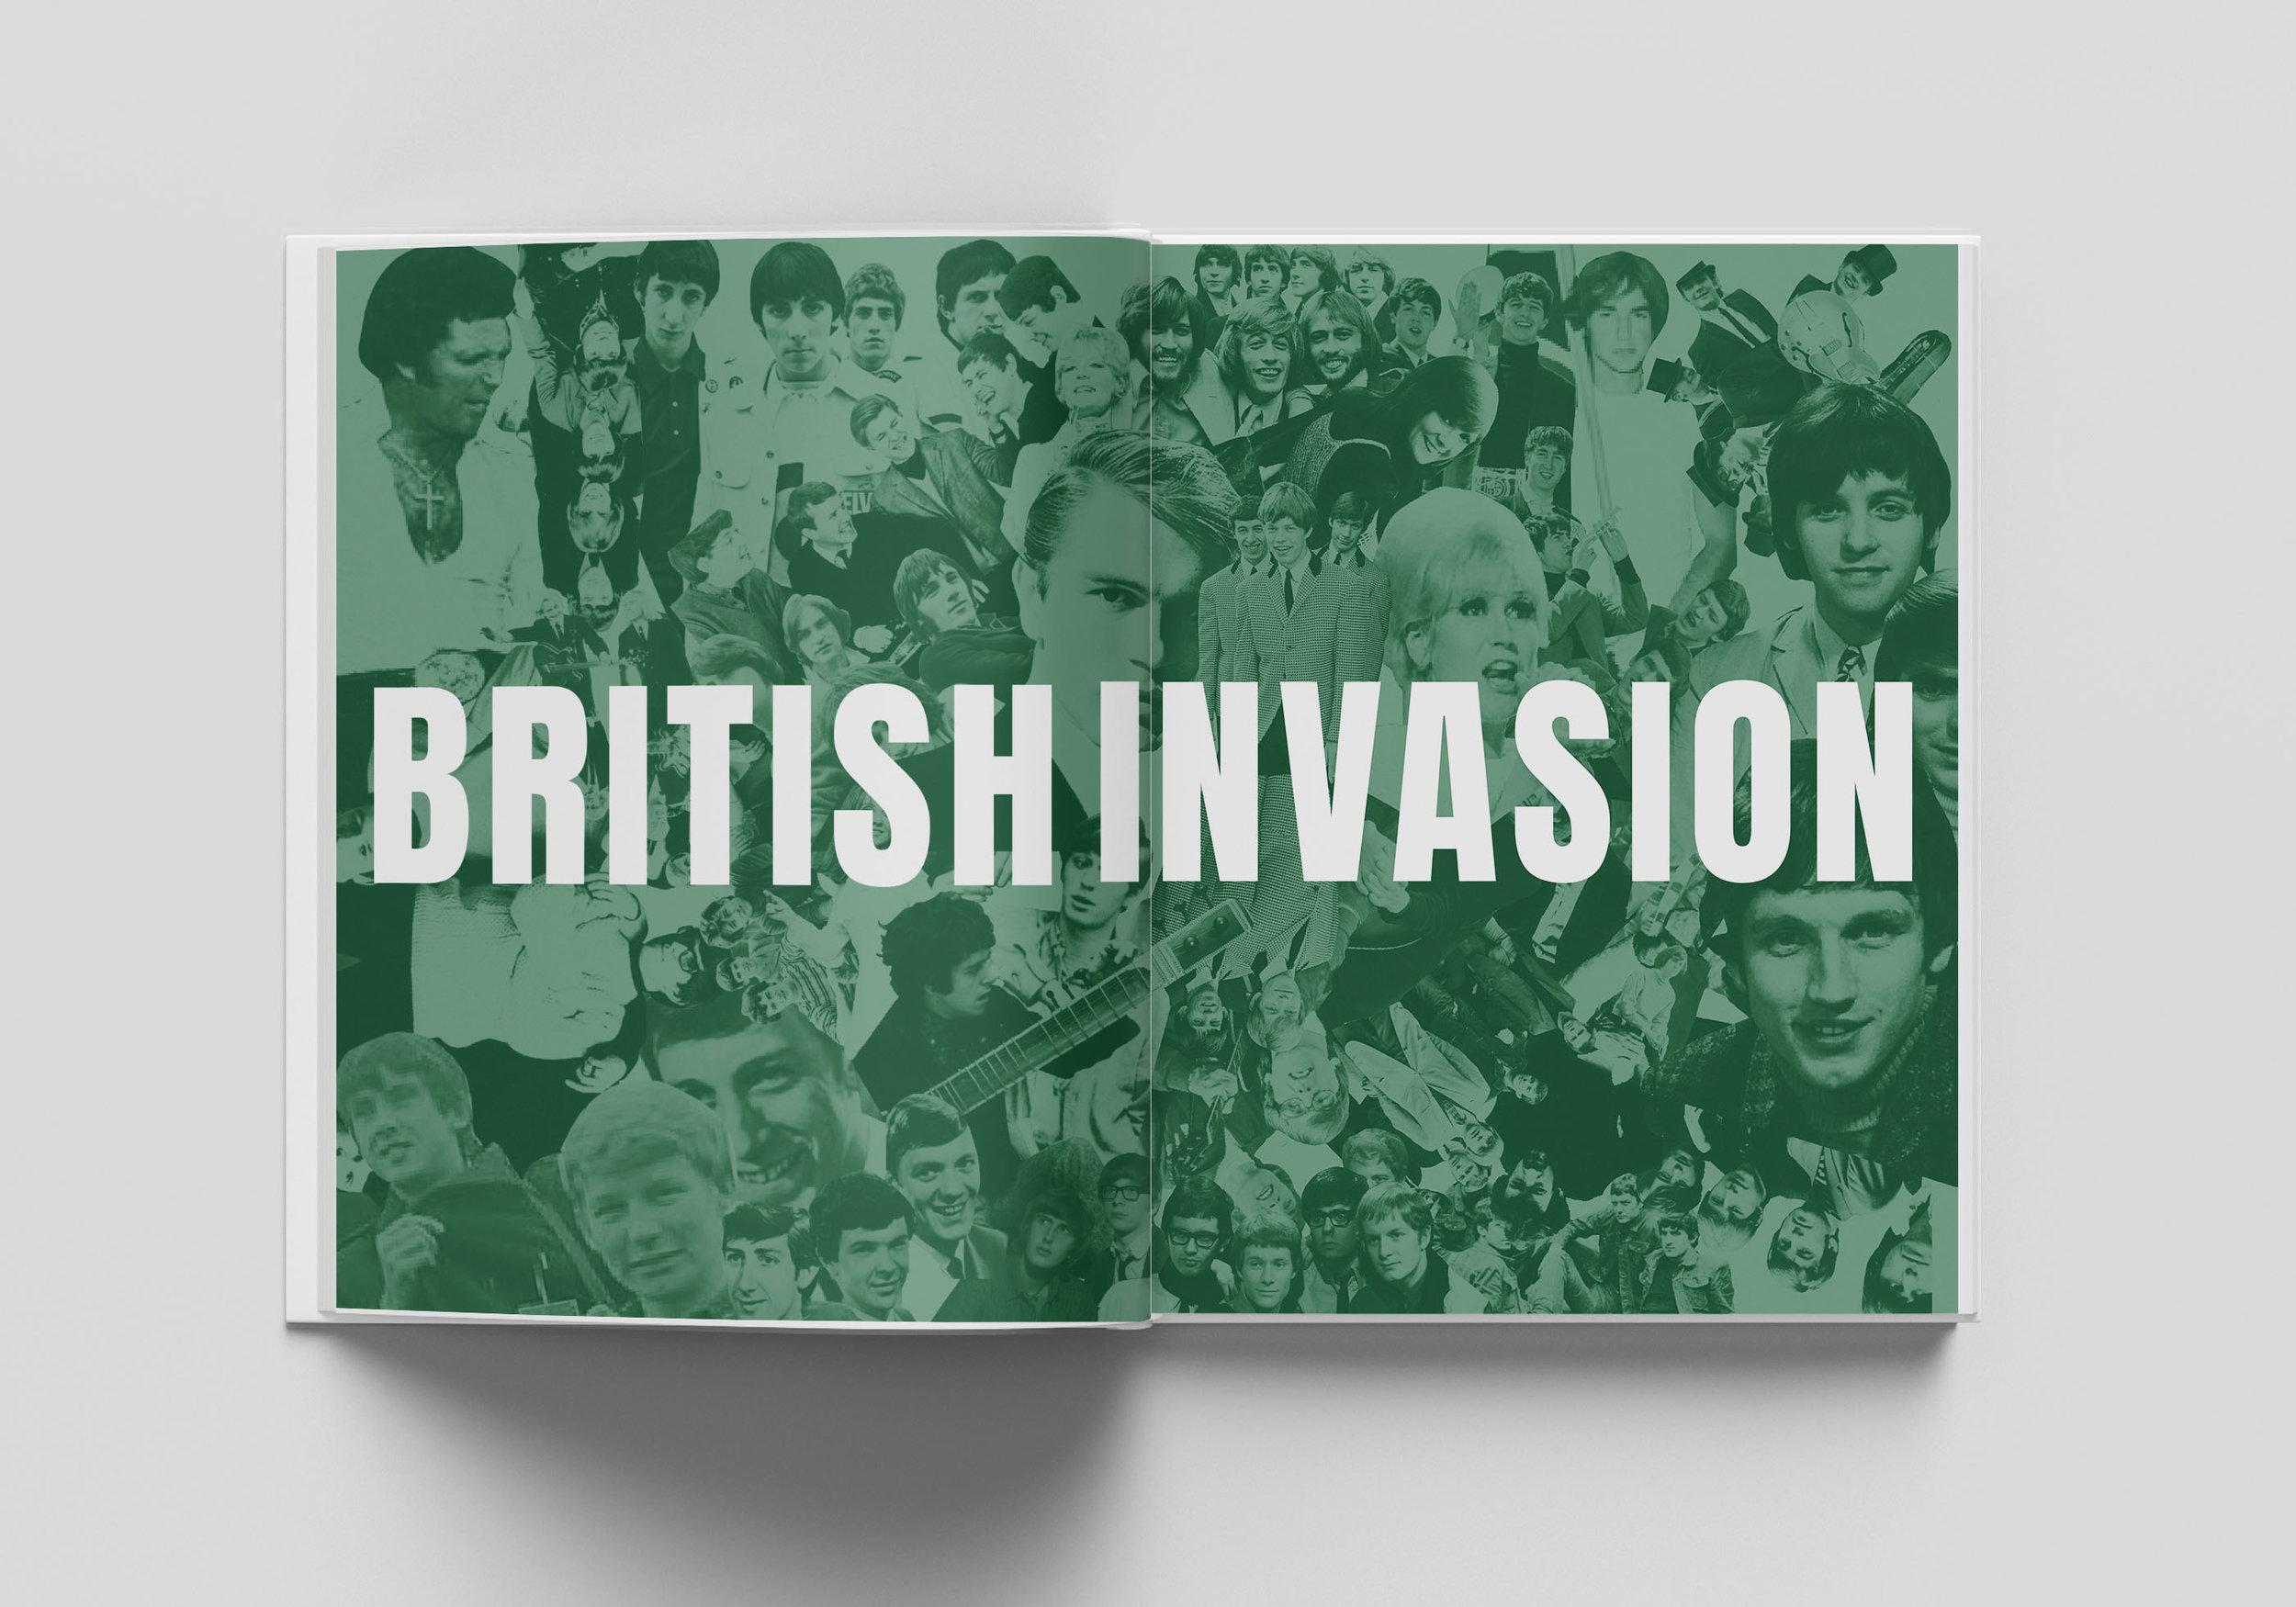 britishinvasion.jpg